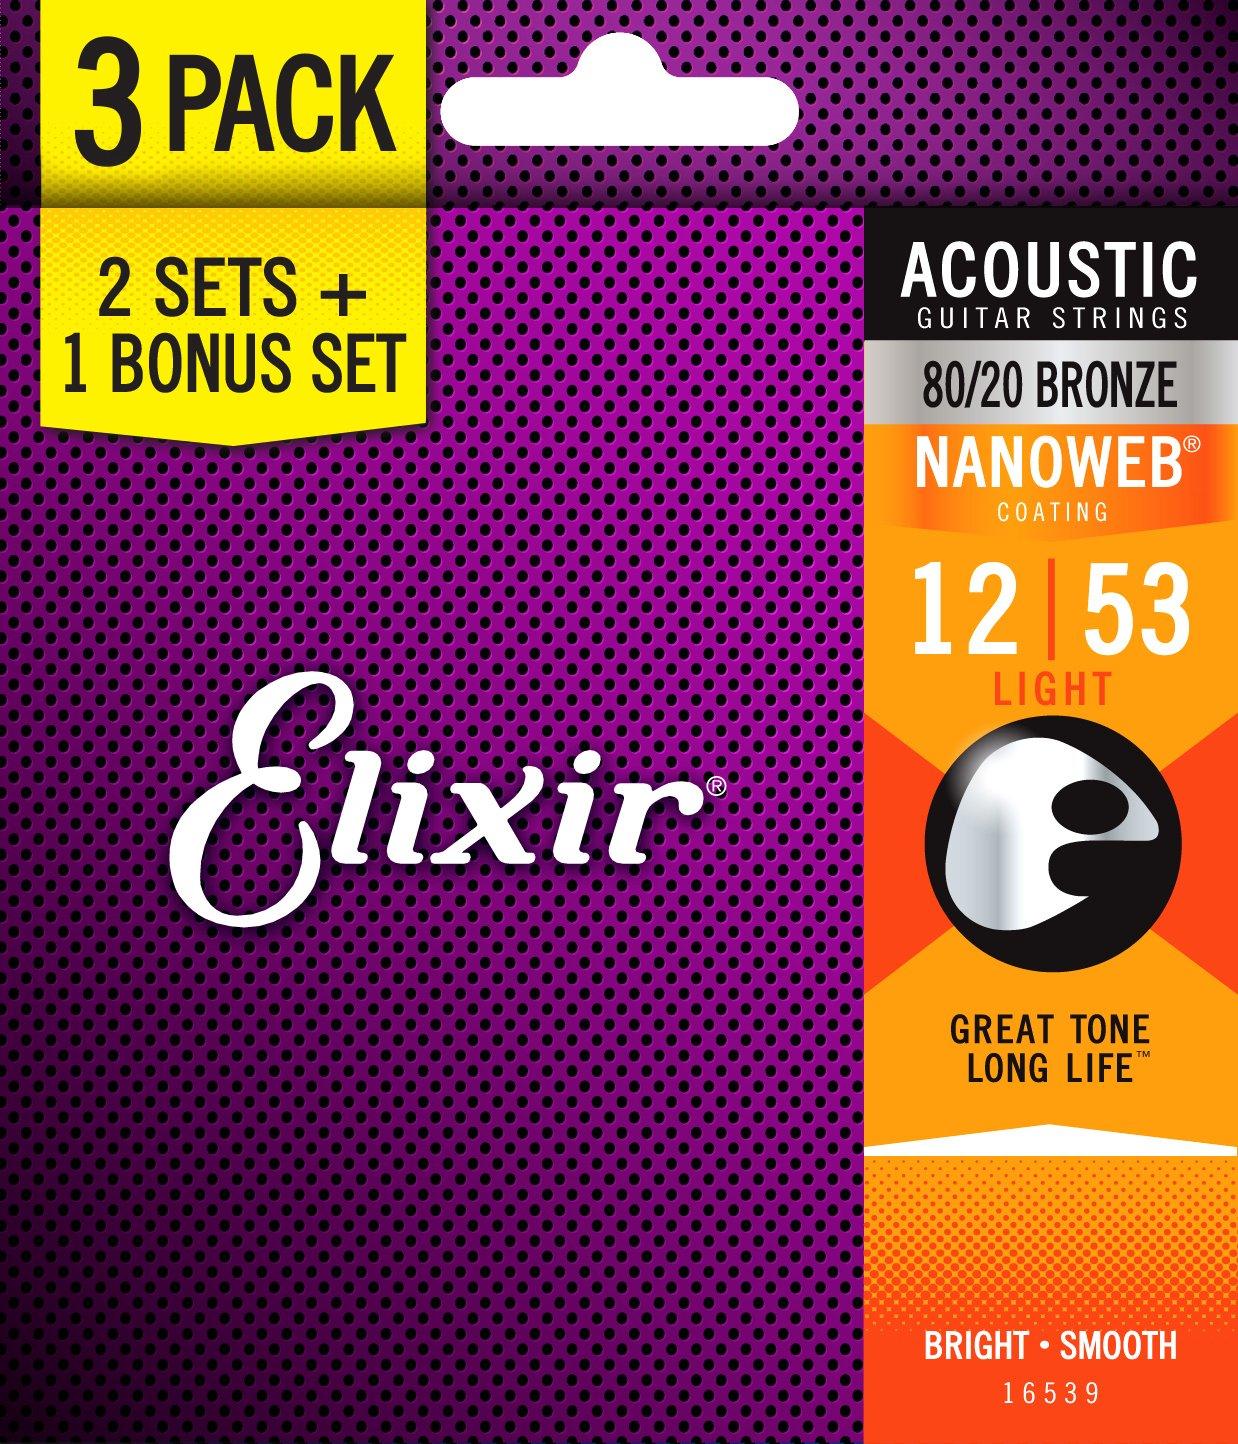 Elixir Strings 16539 Light 80/20 Bronze Nanoweb Acoustic Guitar Strings 3-Pack (.012.053) by Elixir